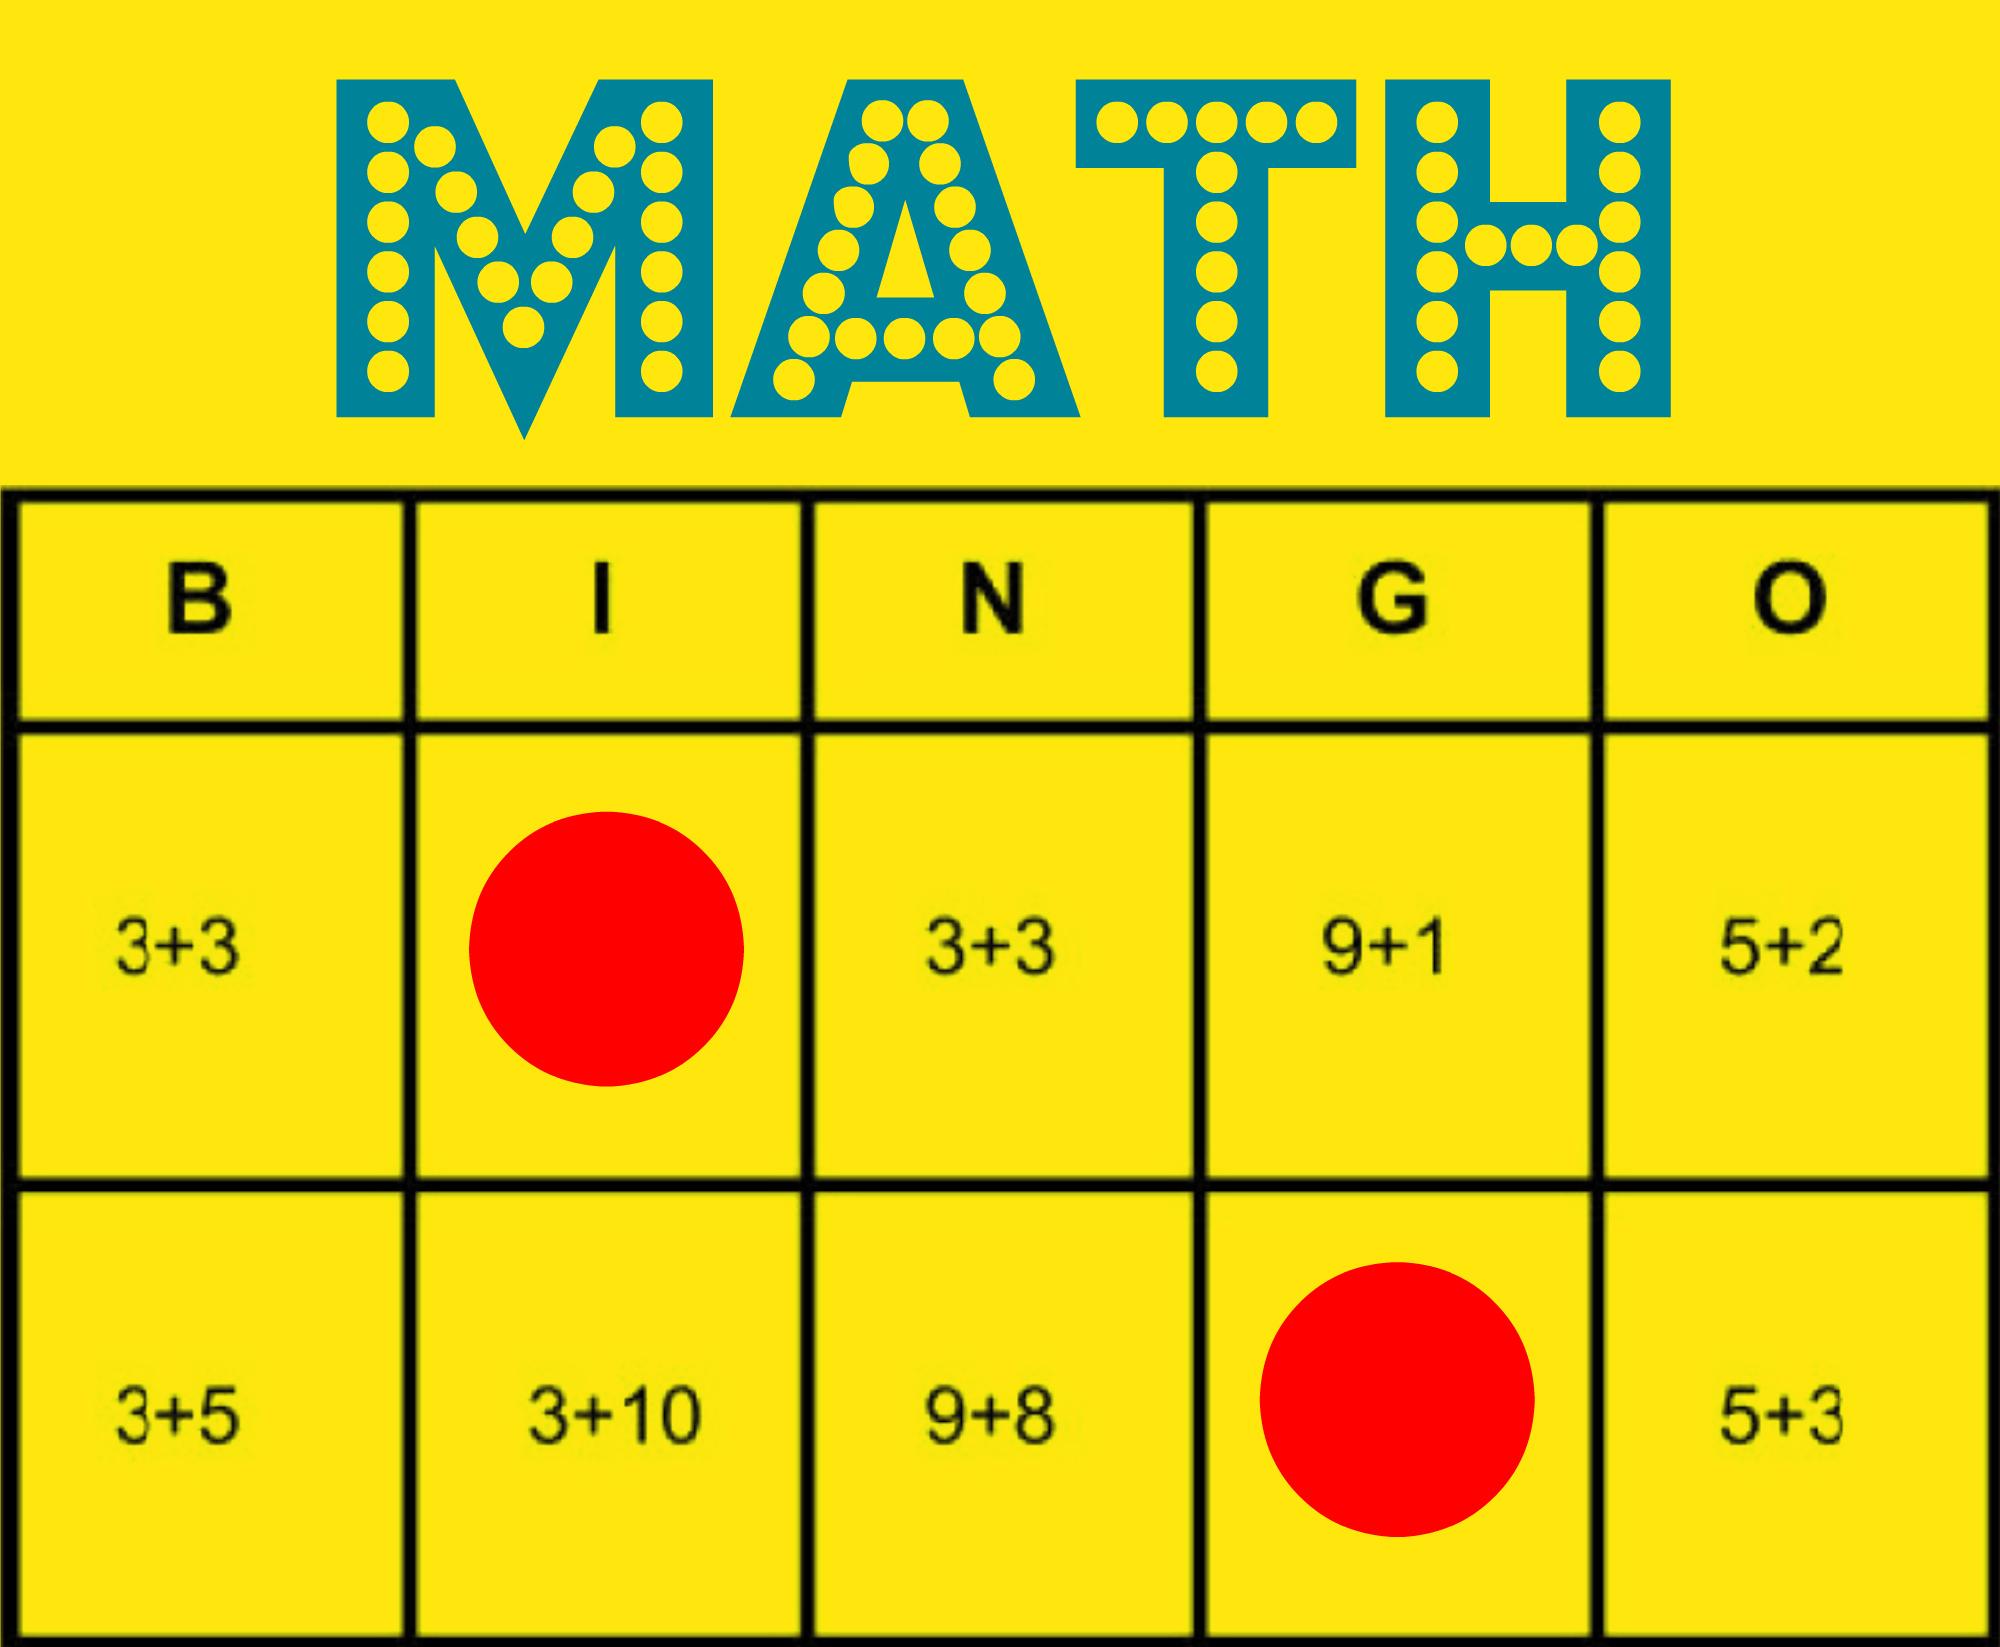 Math Bingo: Free Printable Game To Help All Students Learn